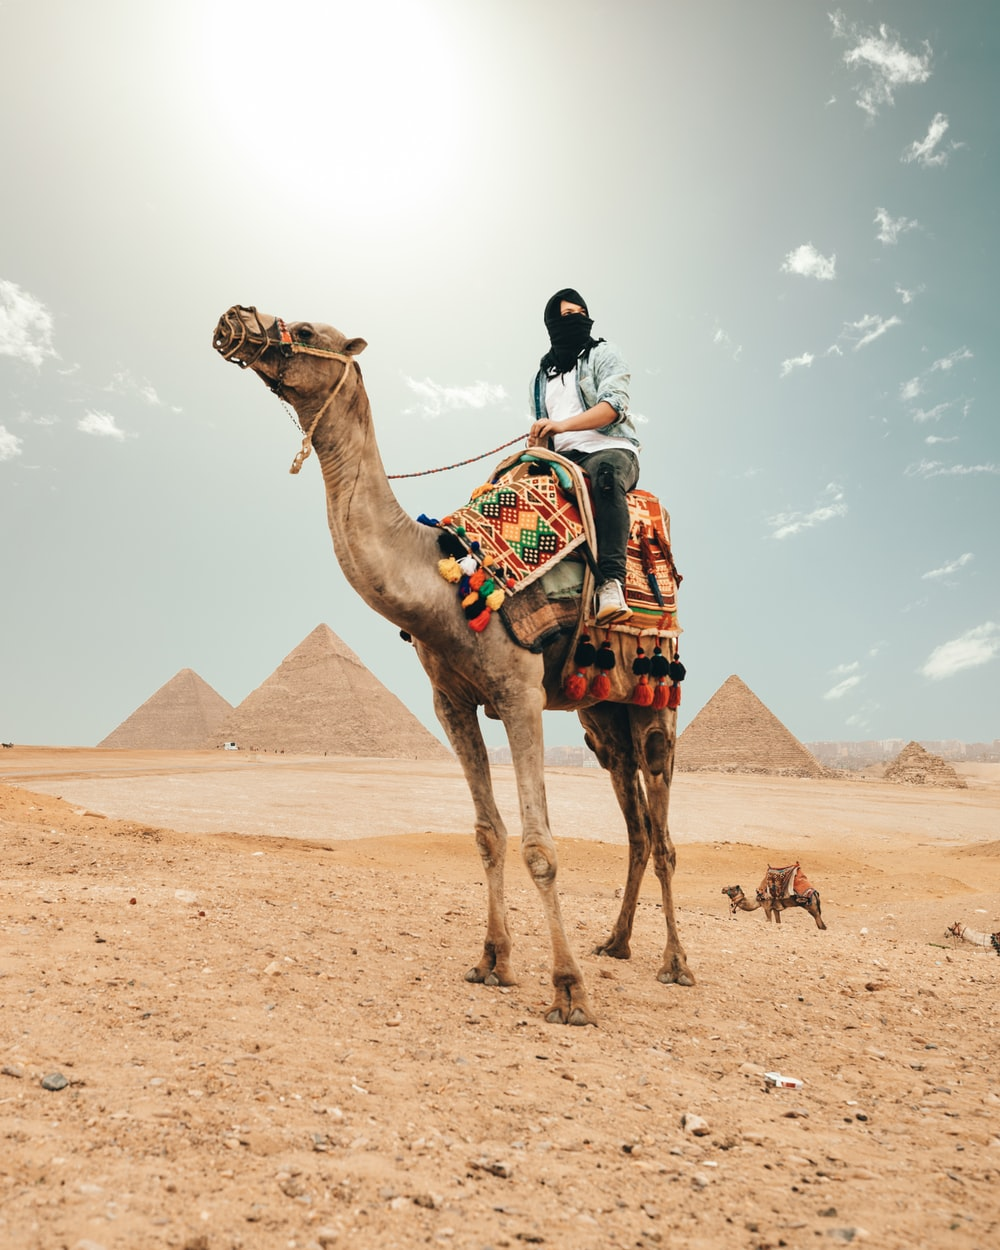 person riding camel